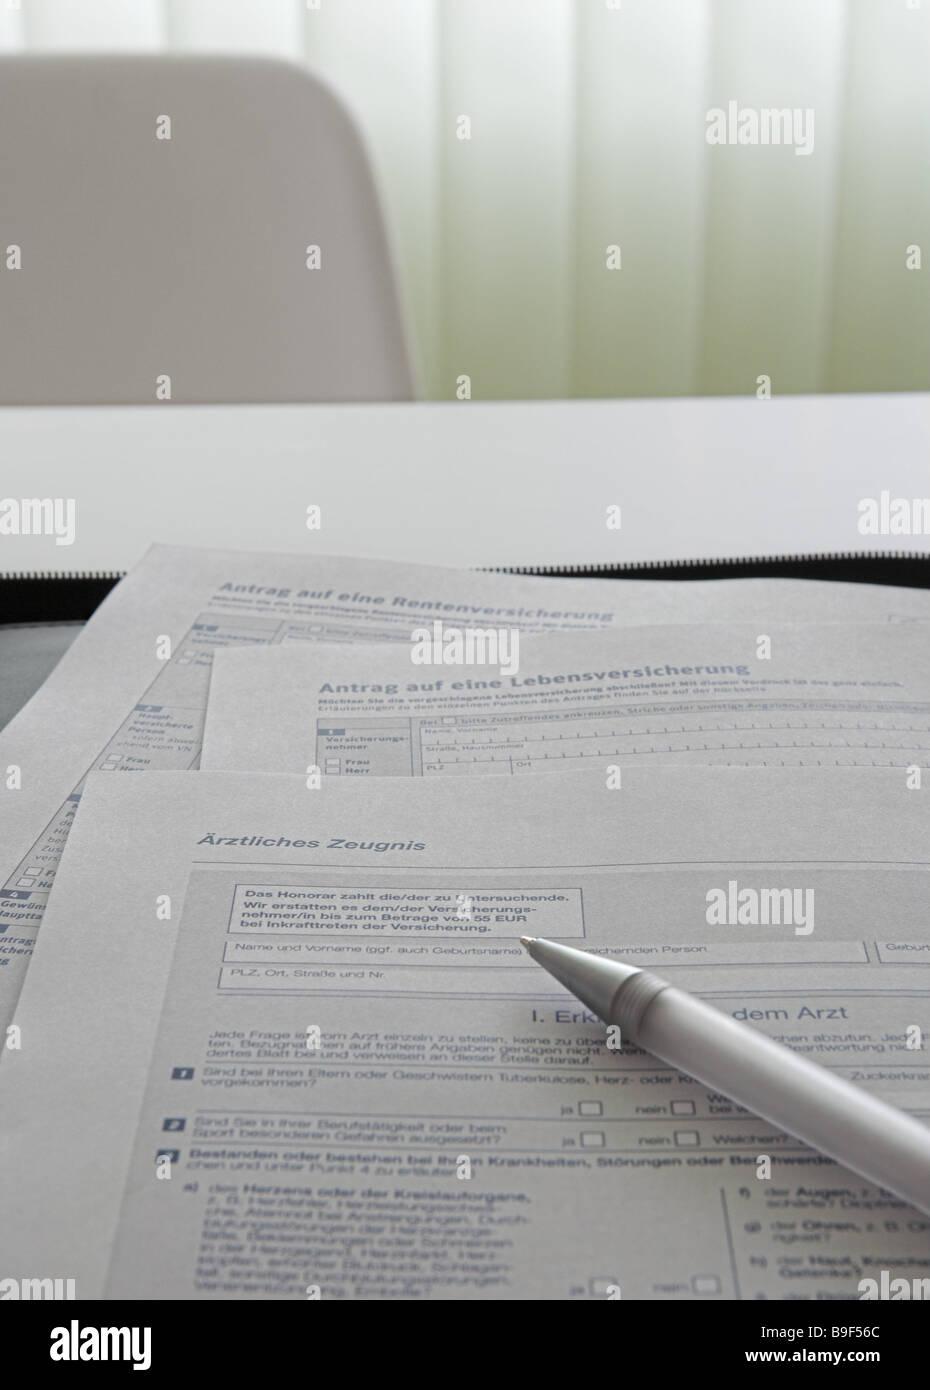 Medical Certificate Stockfotos & Medical Certificate Bilder - Alamy